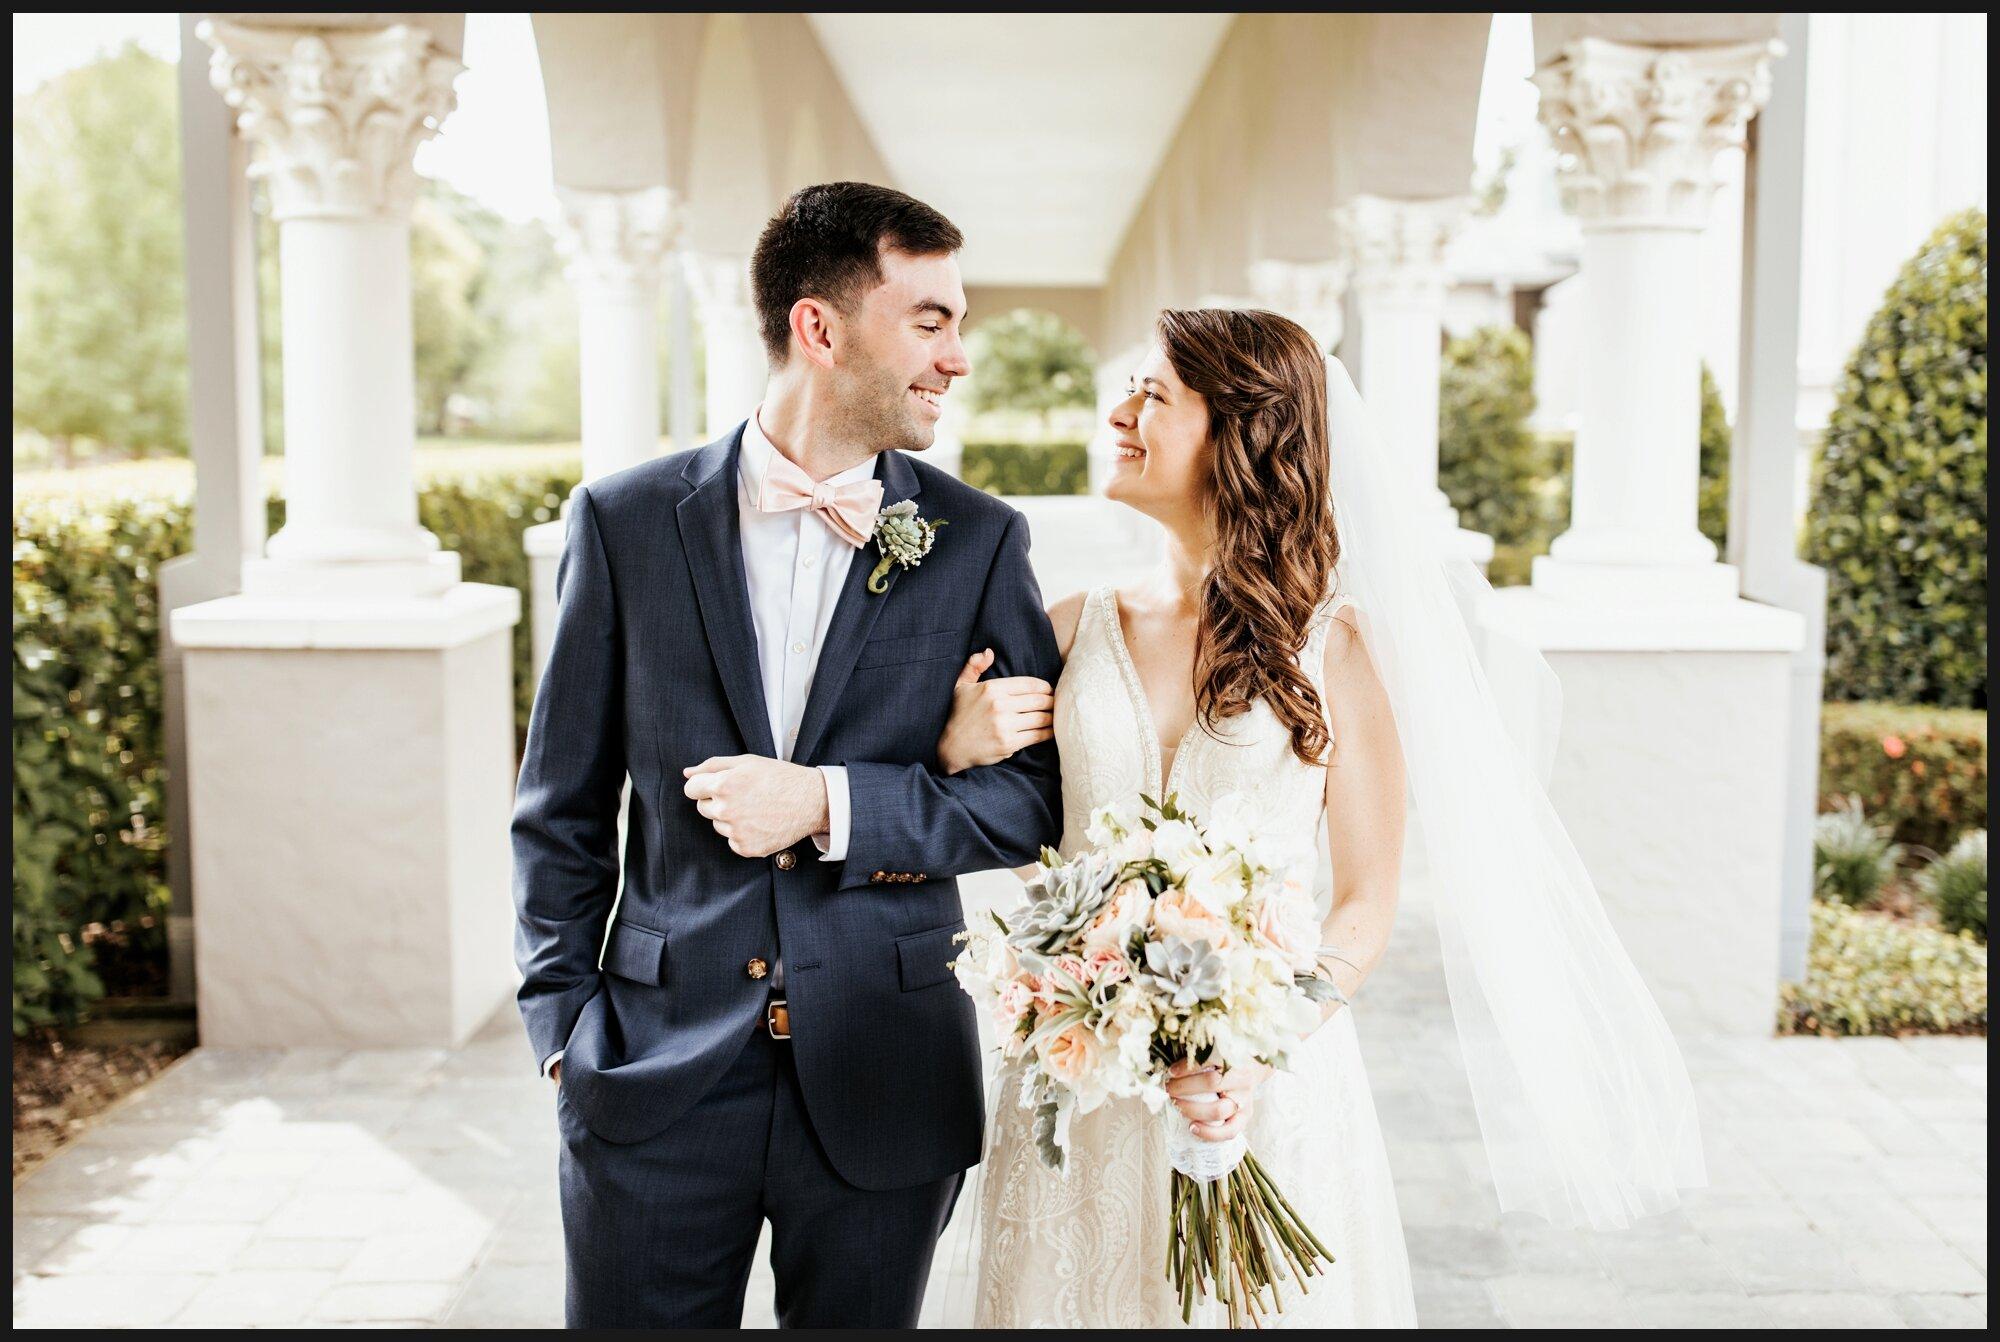 Orlando-Wedding-Photographer-destination-wedding-photographer-florida-wedding-photographer-hawaii-wedding-photographer_0665.jpg